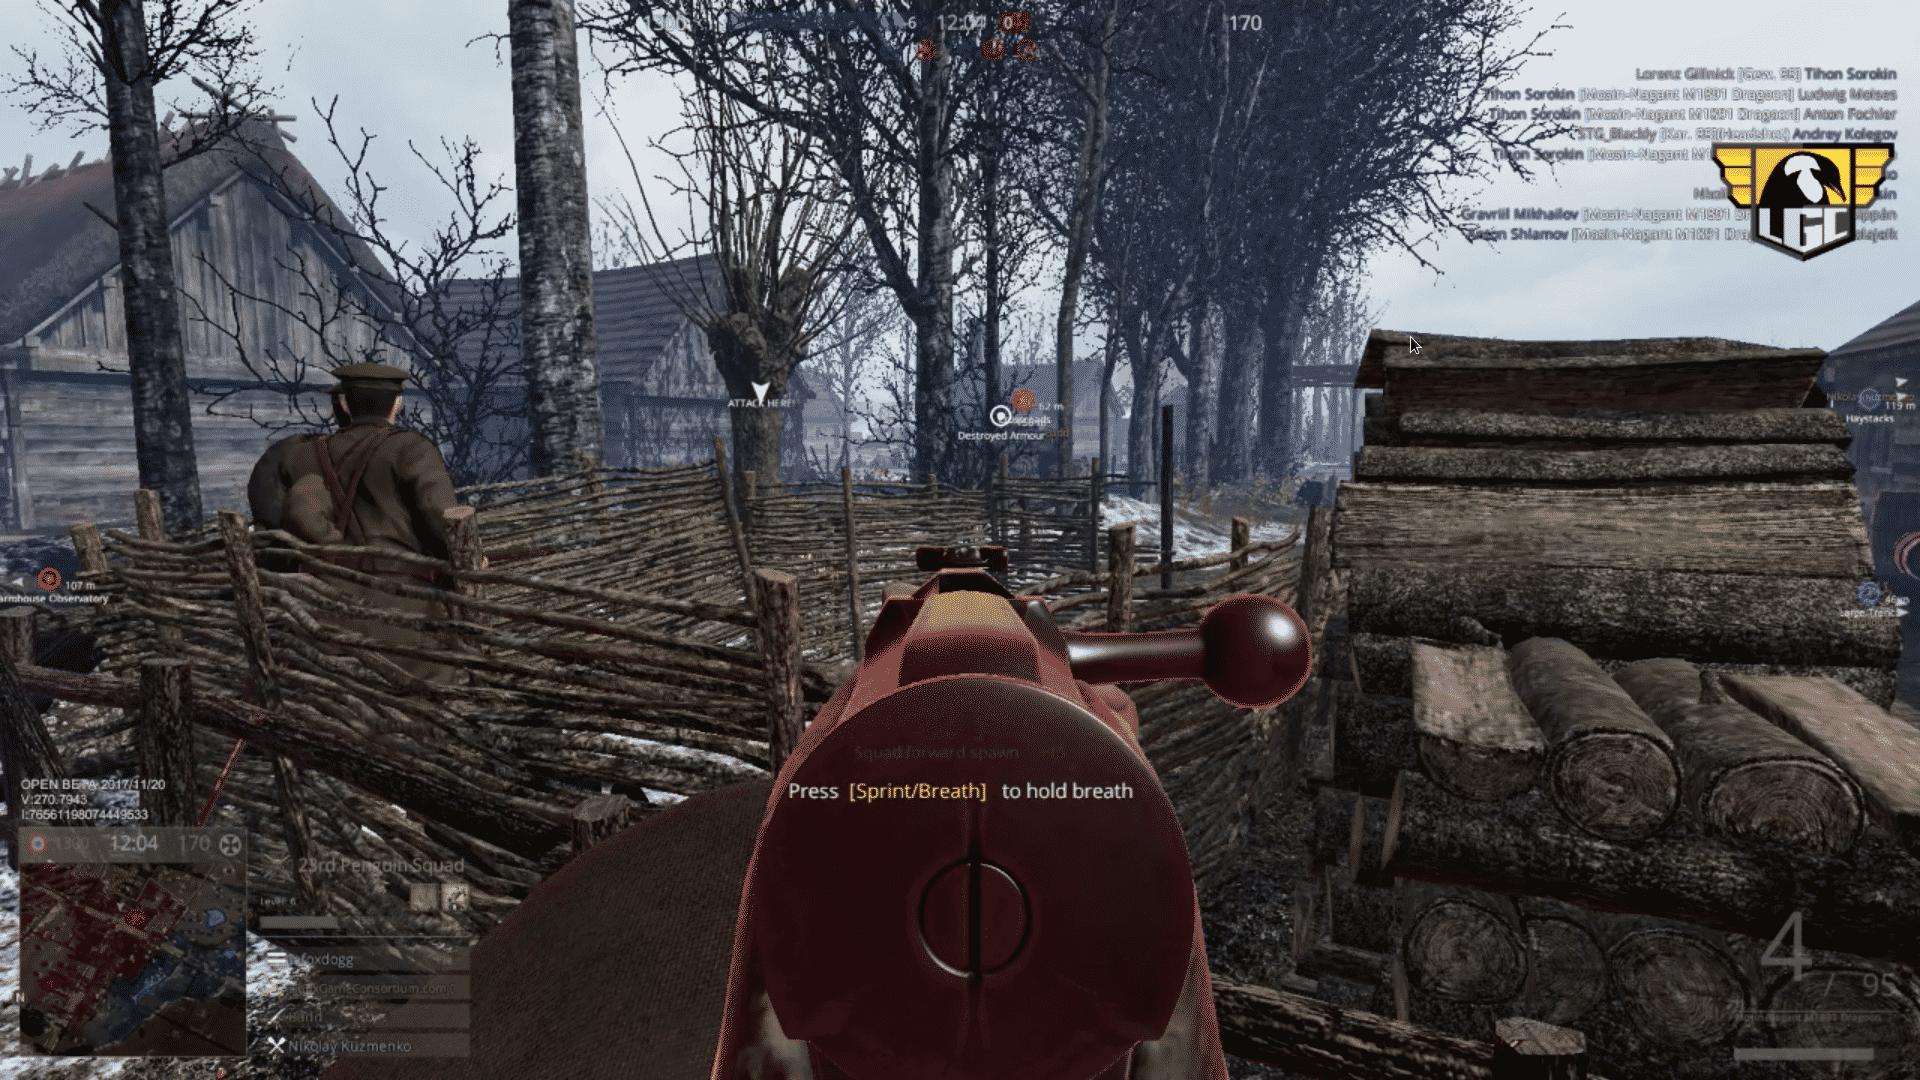 tannenberg weapon shading linux mac windows games 2017 screenshot